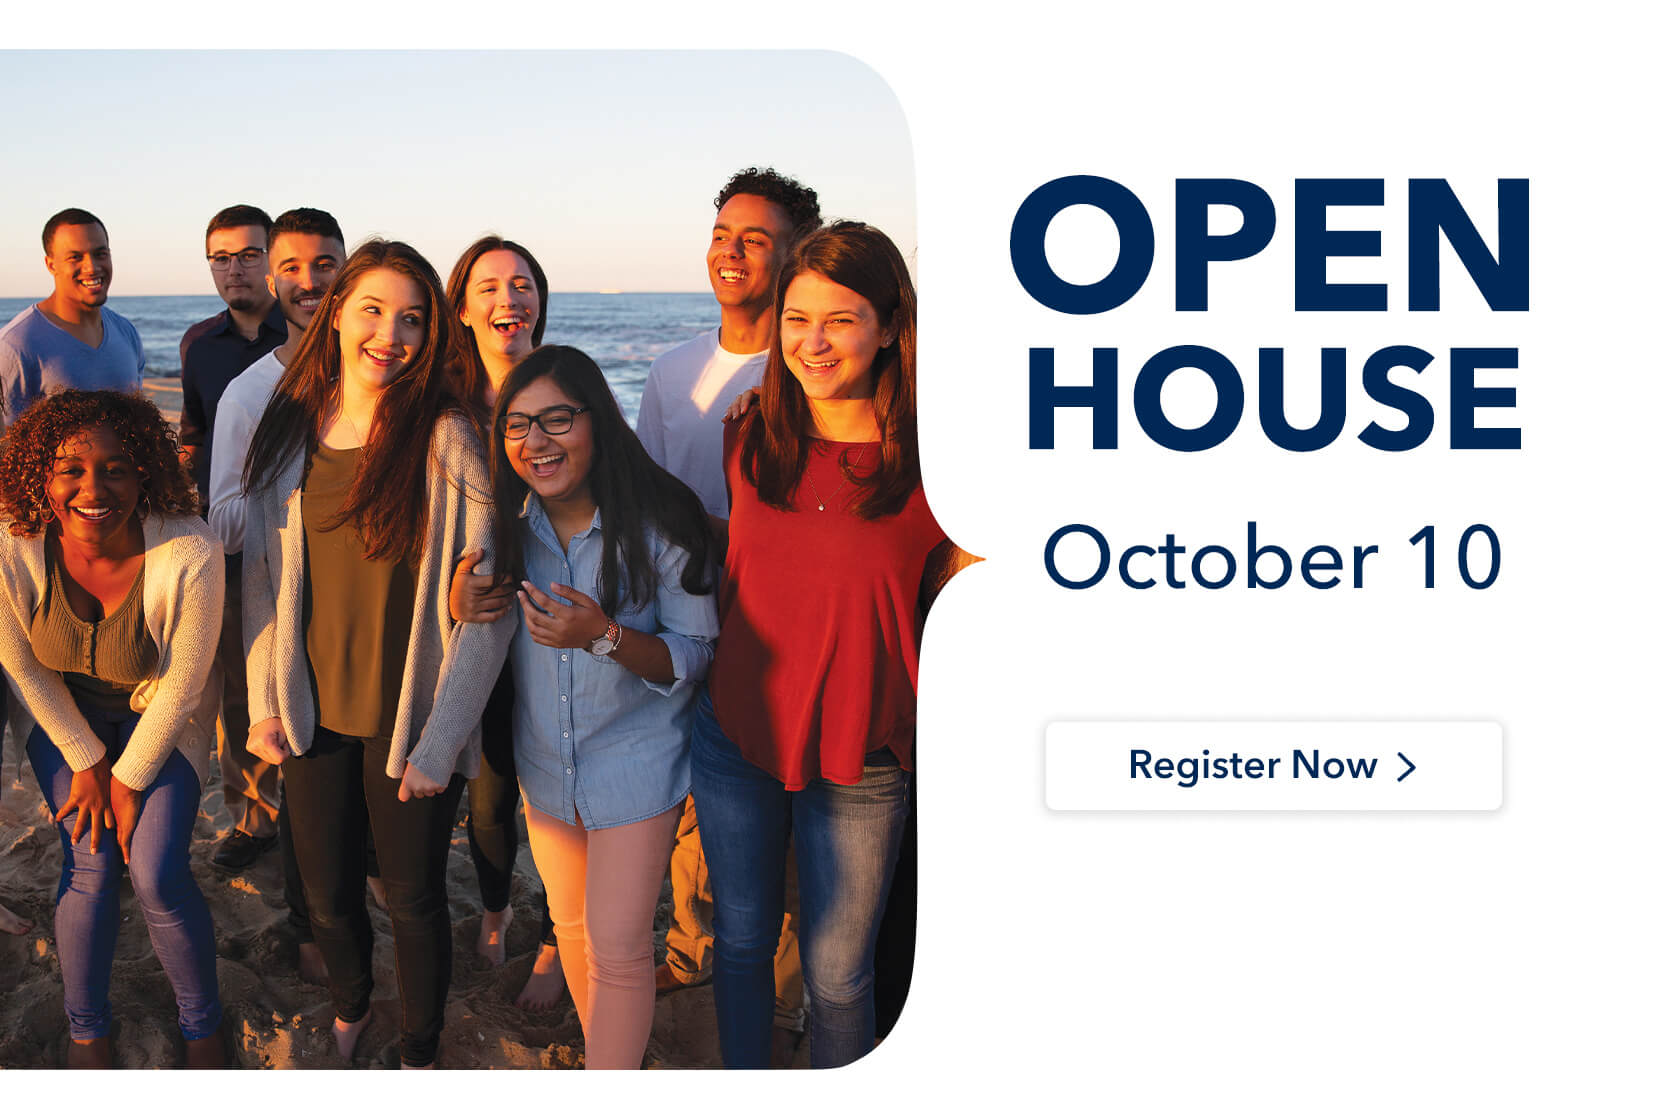 Register Now for Open House, October 10